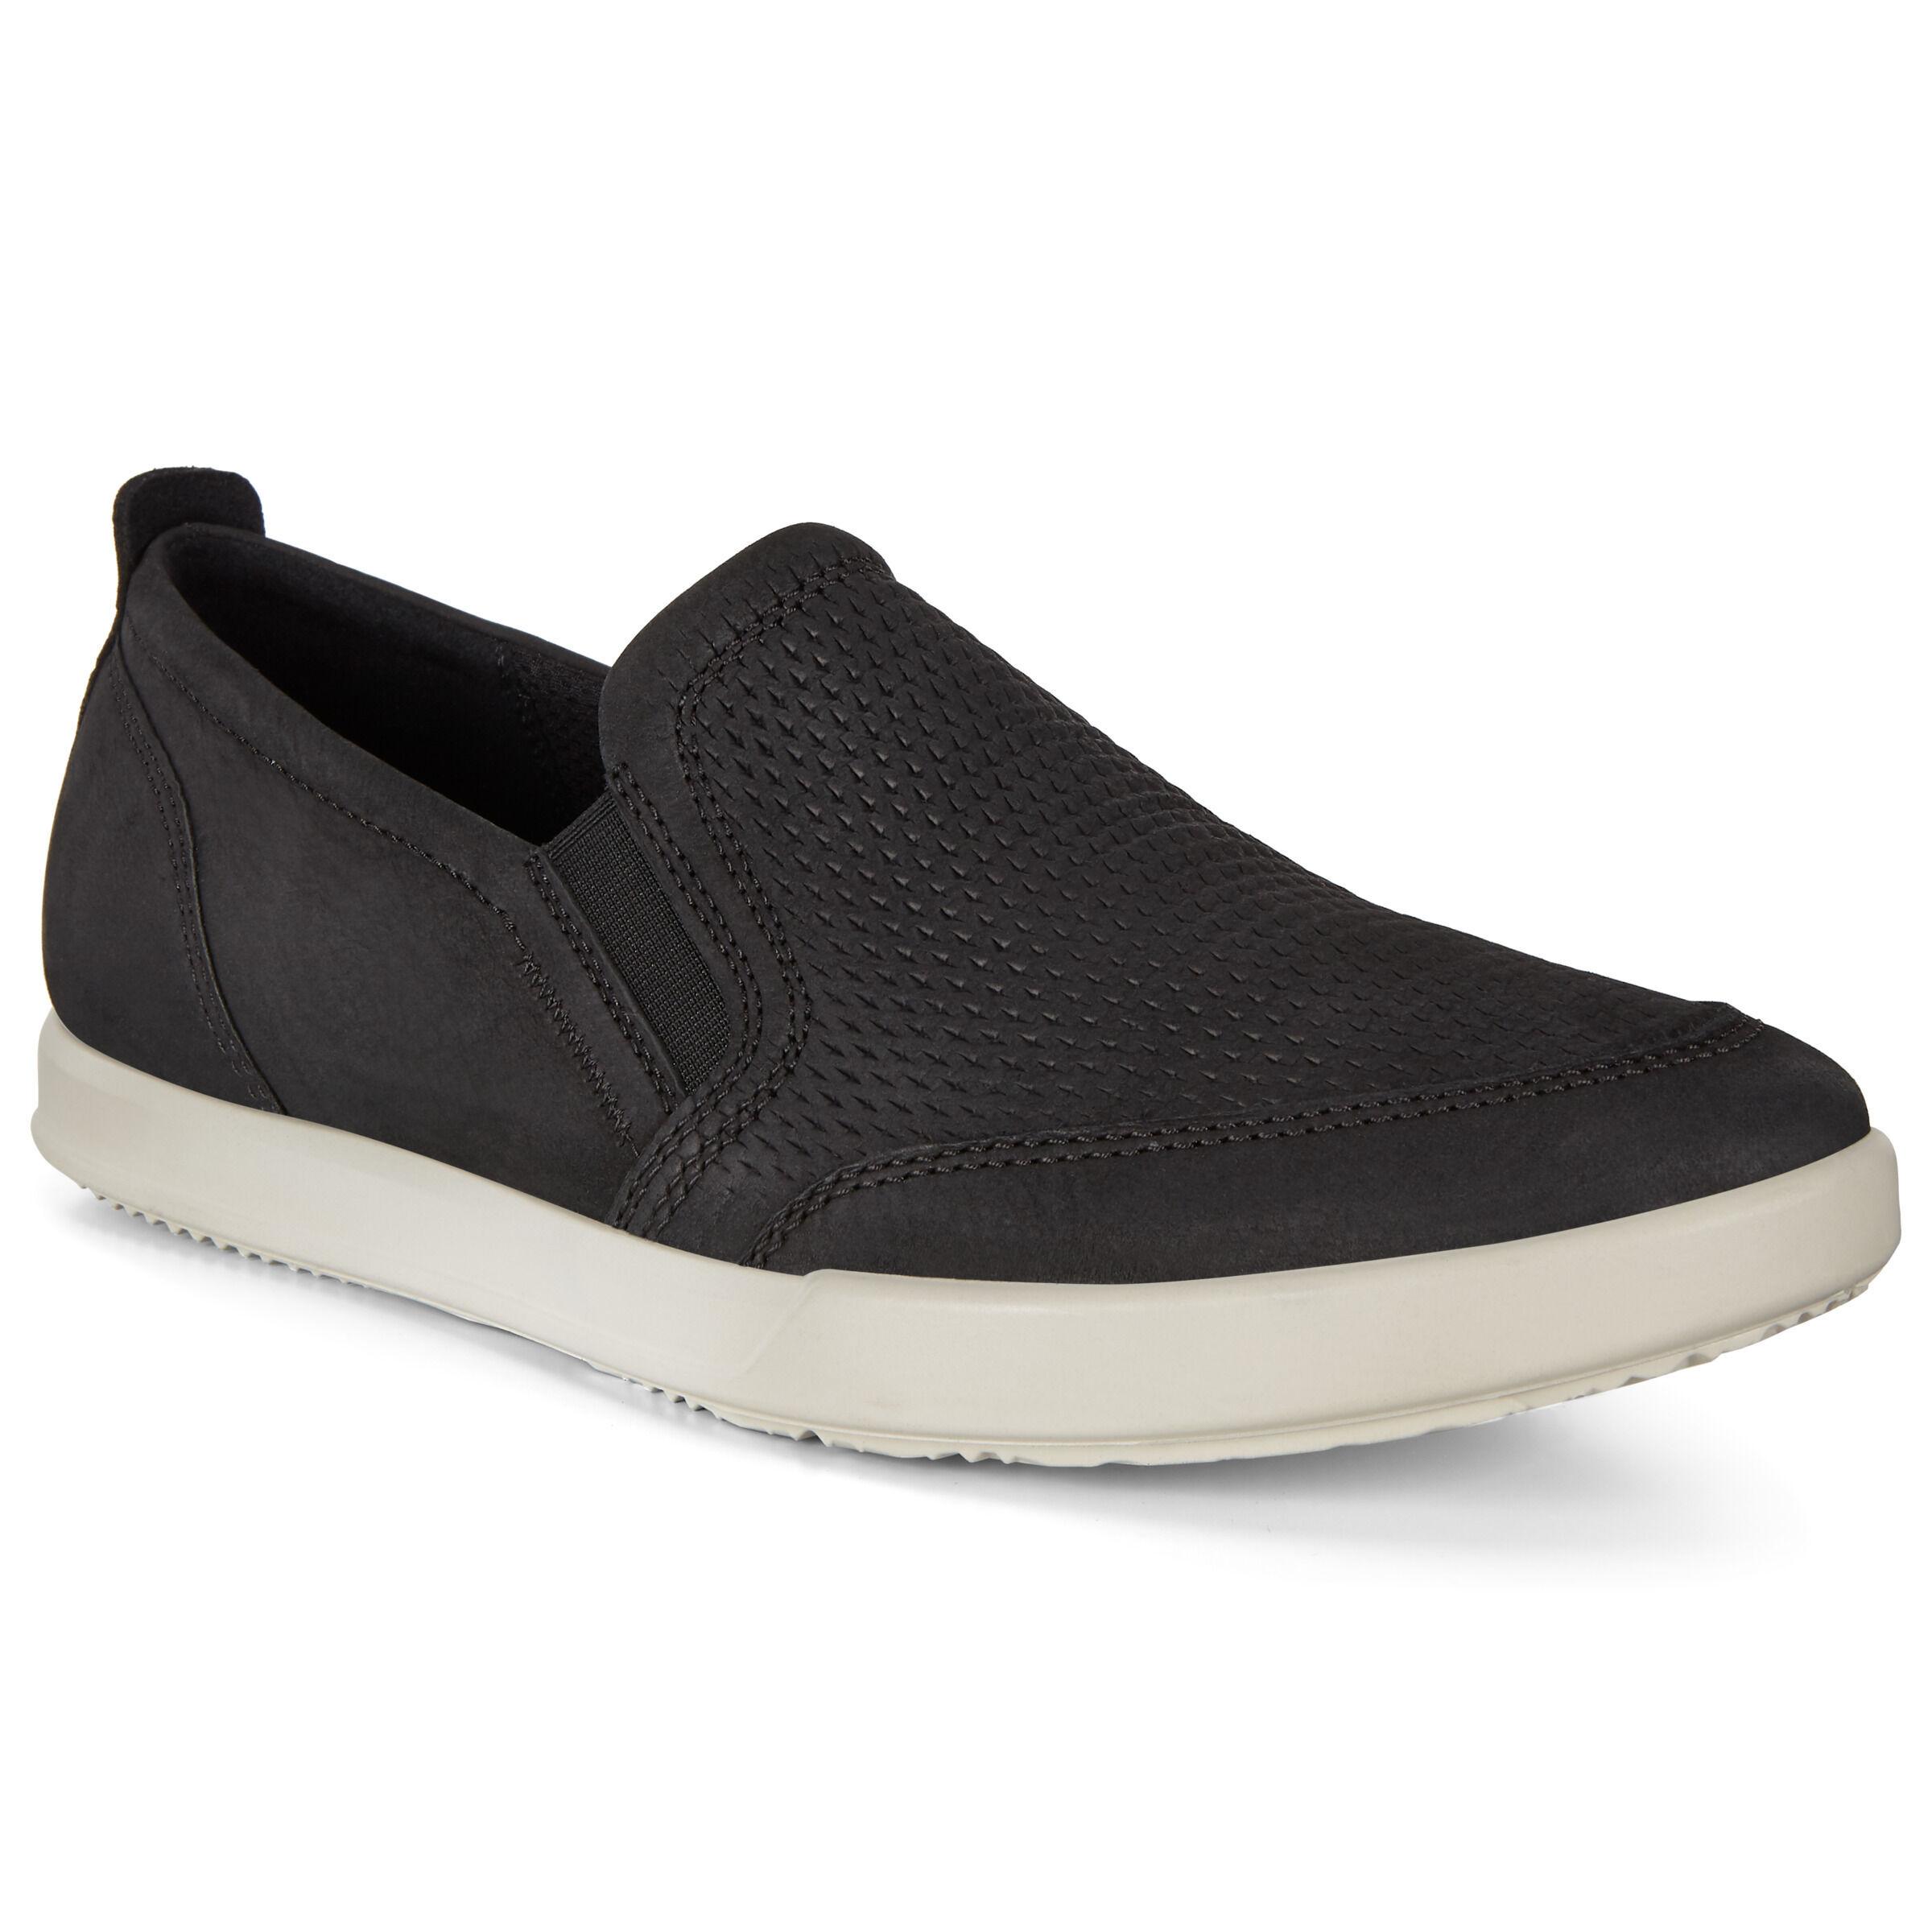 ECCO Collin 2.0 Mens Shoes Sneakers size  : 13 - Black